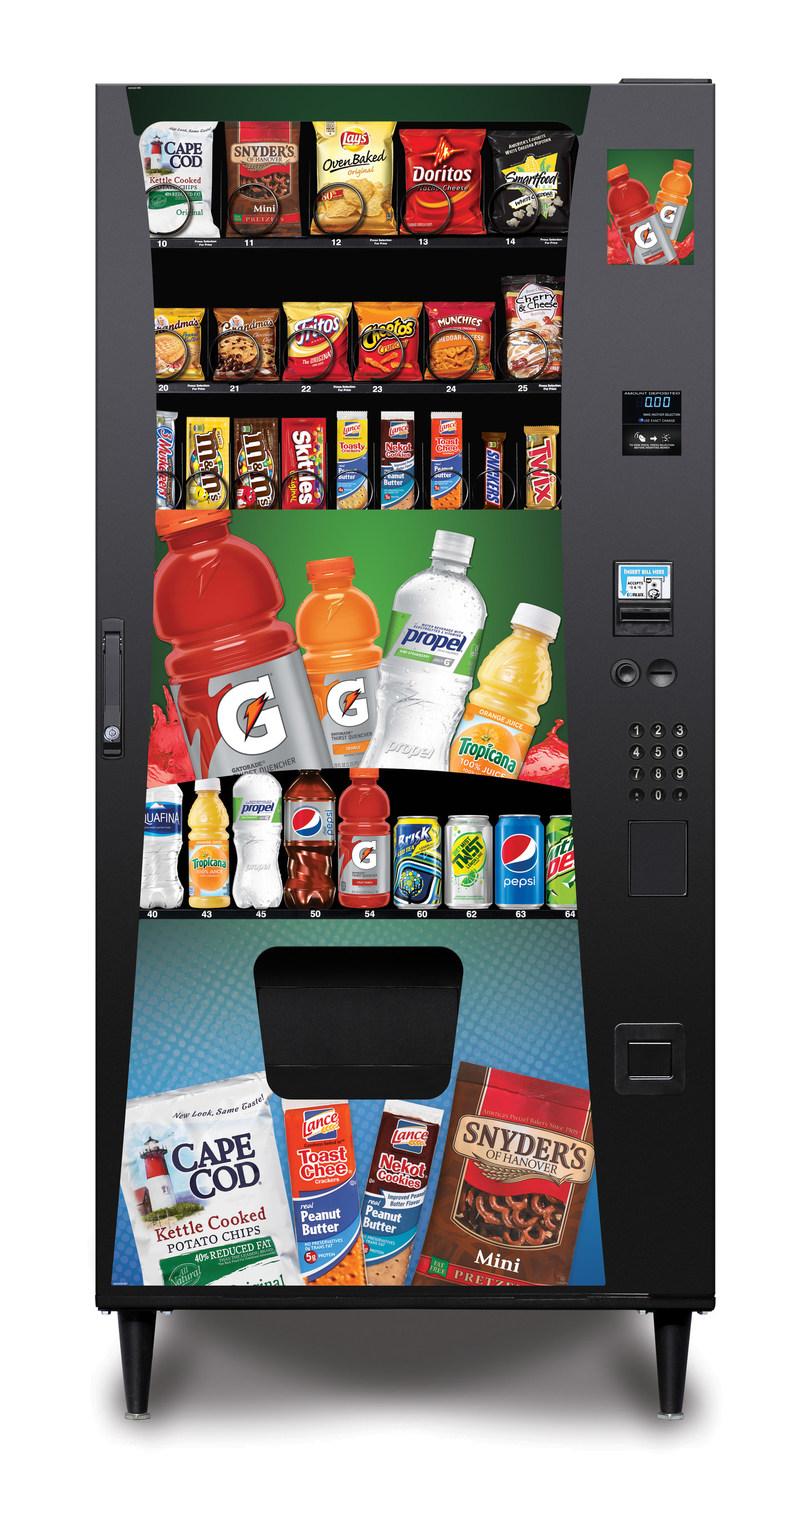 Selectivend Announces Product Rebate Program on Samsclub.com